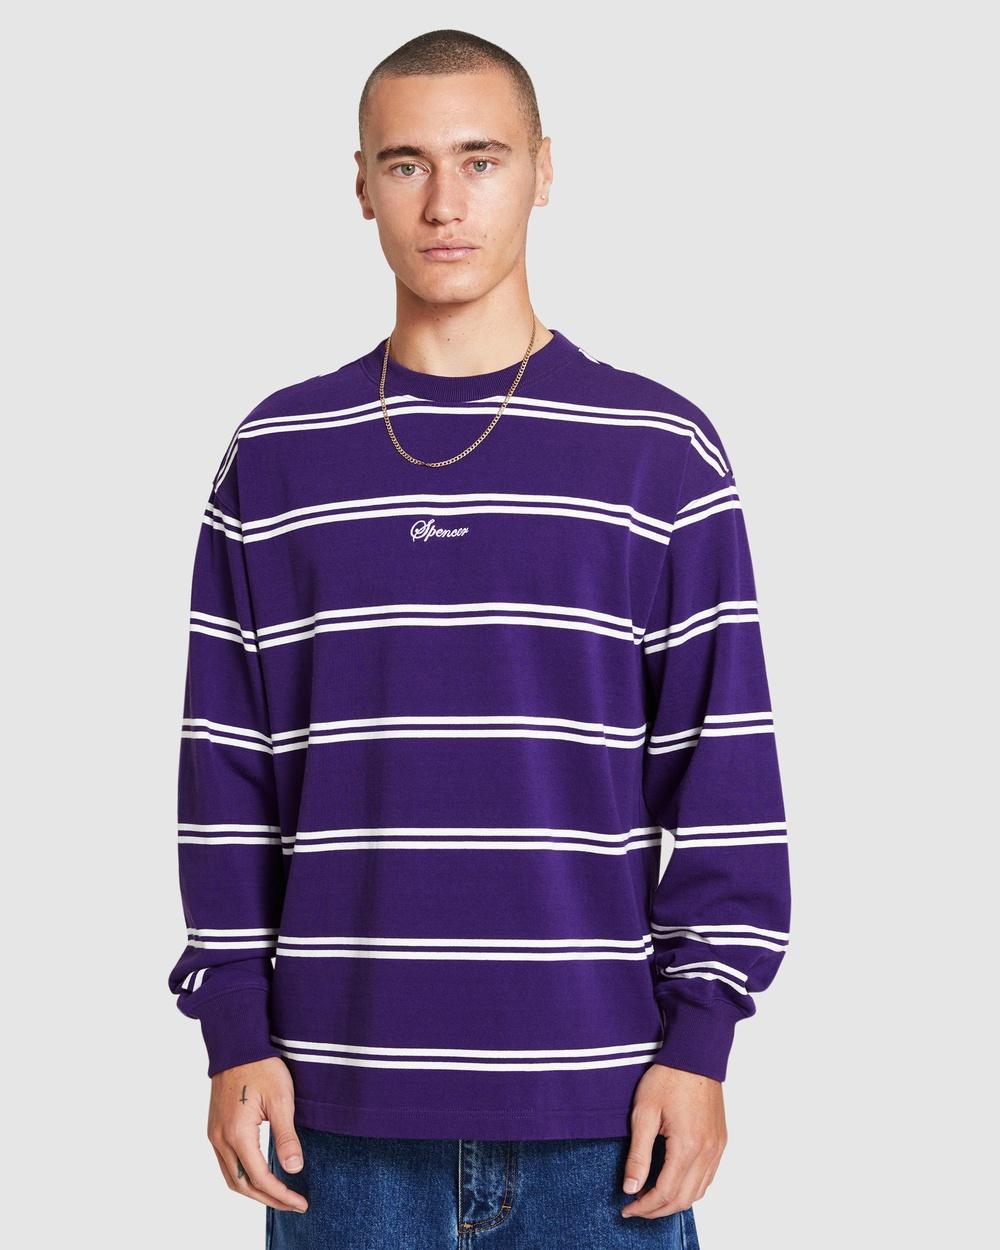 Spencer Project Ascot Long Sleeve T Shirt T-Shirts PURPLE T-Shirt Australia